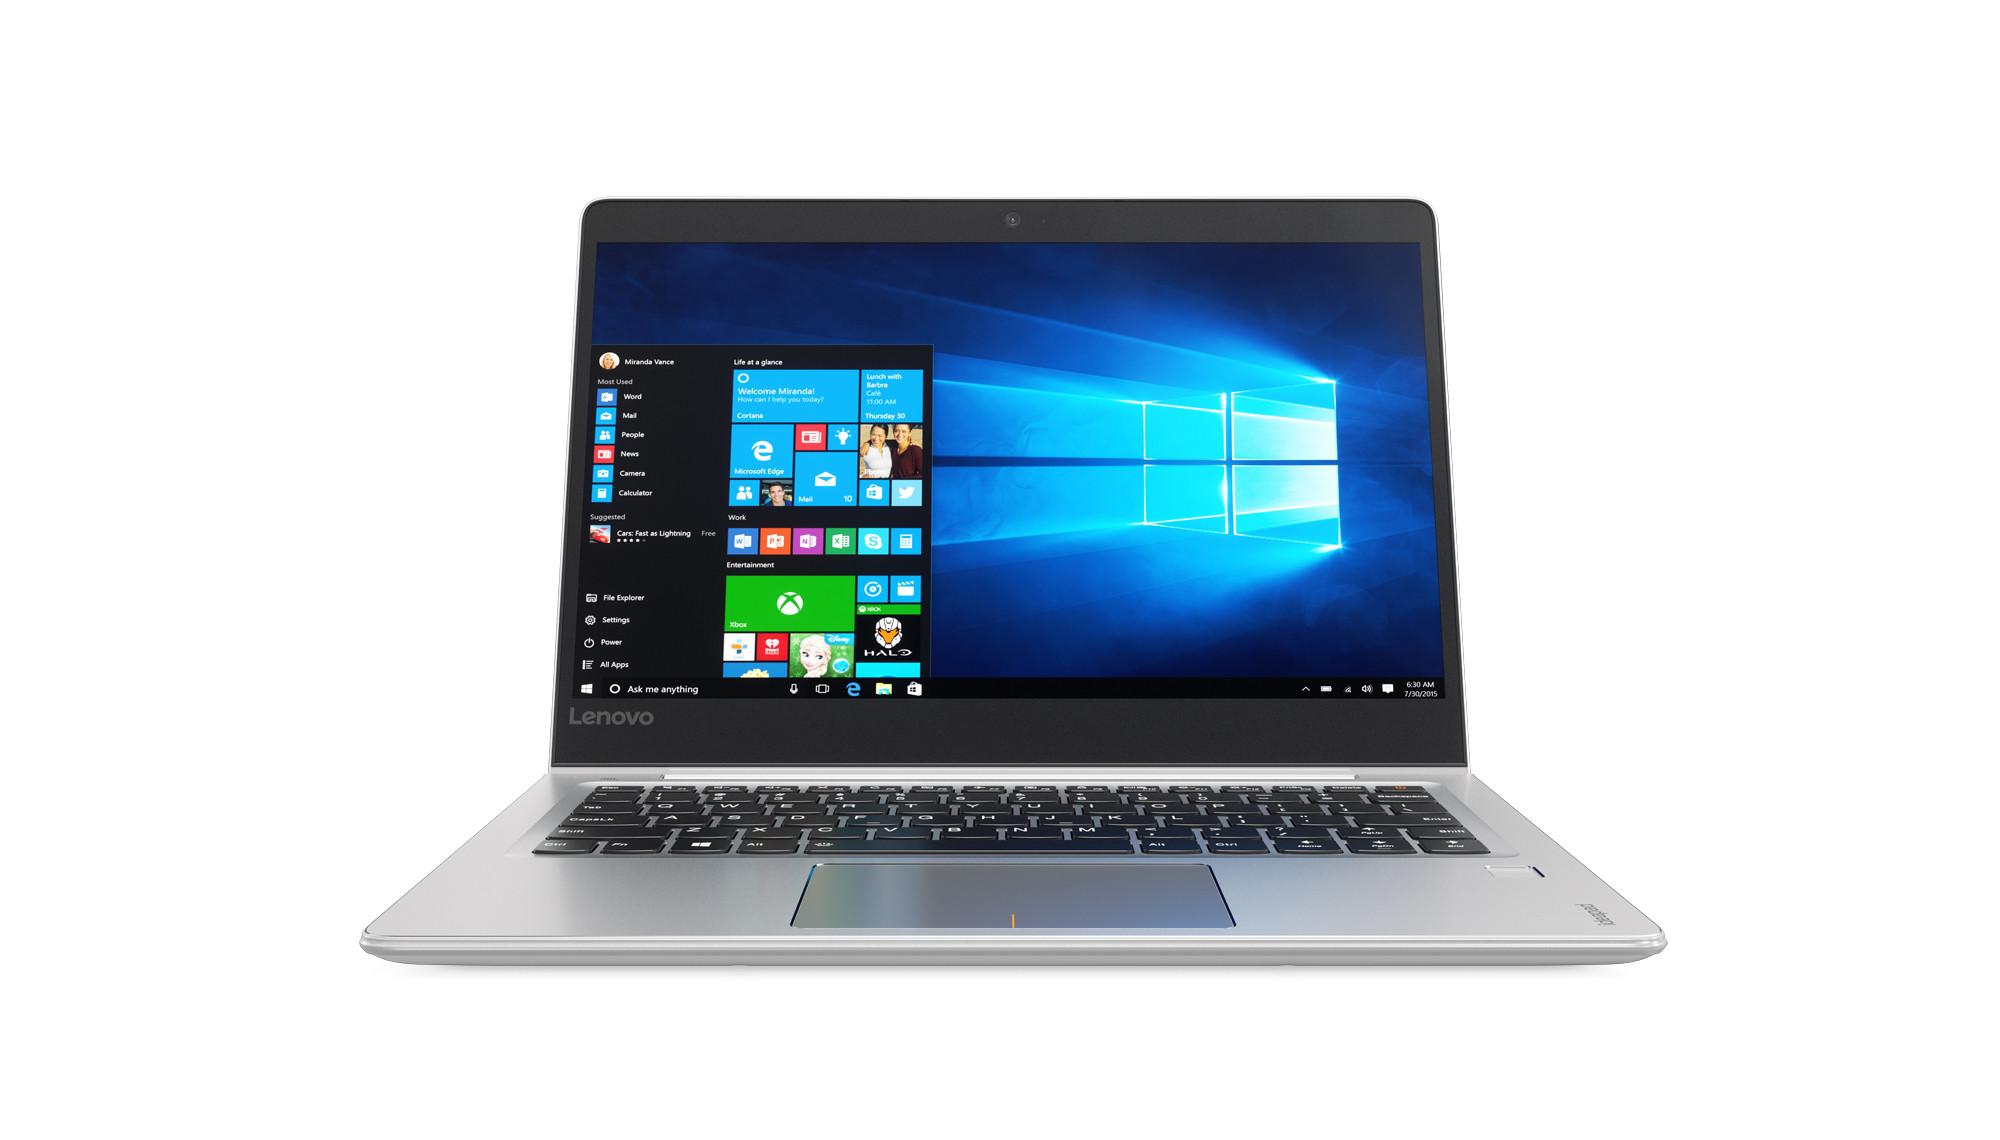 Lenovo IdeaPad 710S 13.3 FHD IPS AG/I5-7200U/256G SSD/8G/GF 940 2G/W10 stříbrný